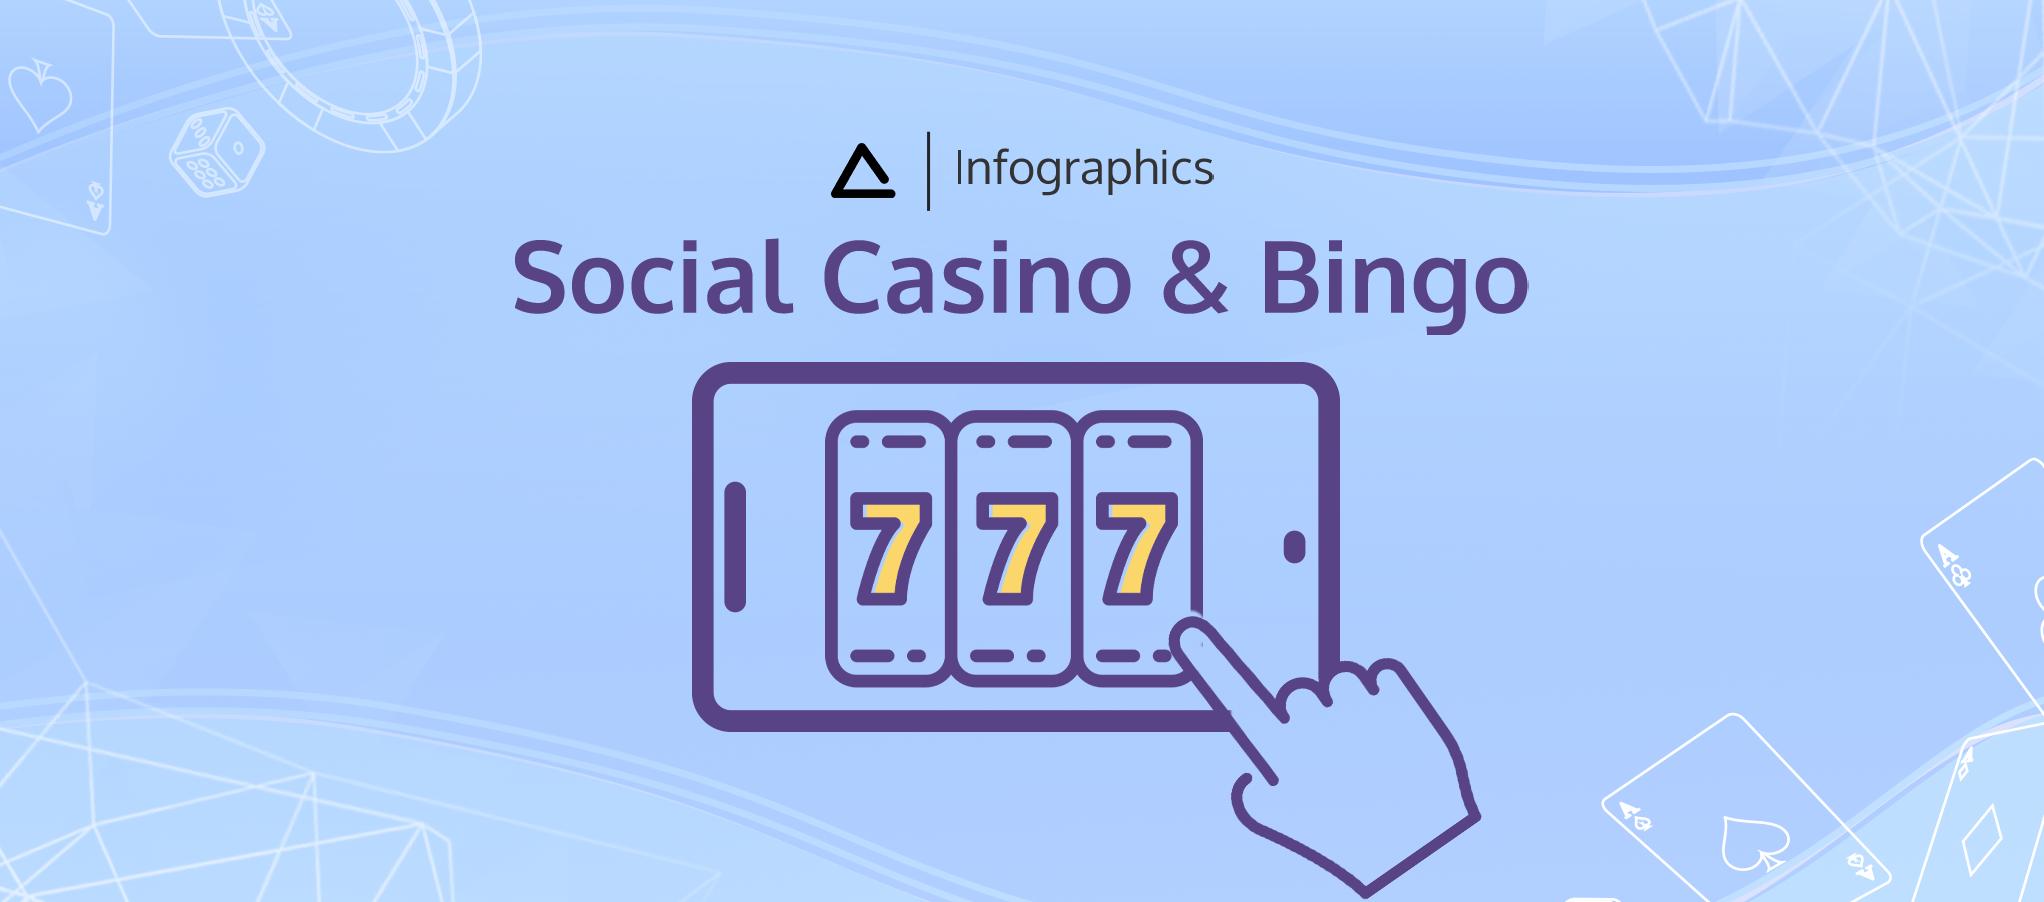 Social casino bingo